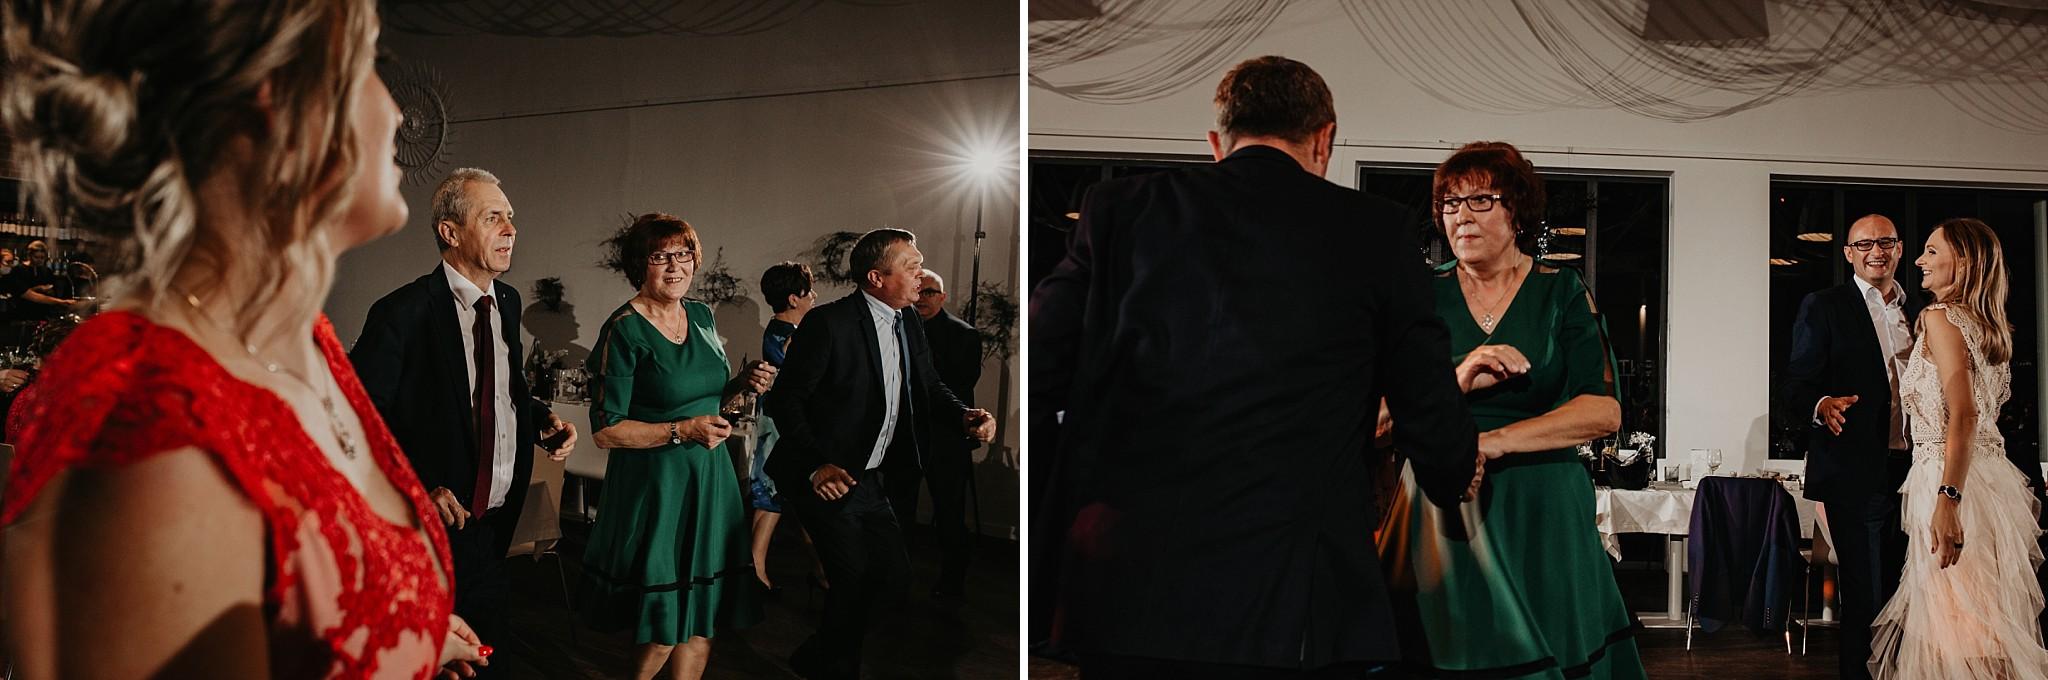 fotograf poznan wesele dobra truskawka piekne wesele pod poznaniem wesele w dobrej truskawce piekna para mloda slub marzen slub koronawirus slub listopad wesele koronawirus 401